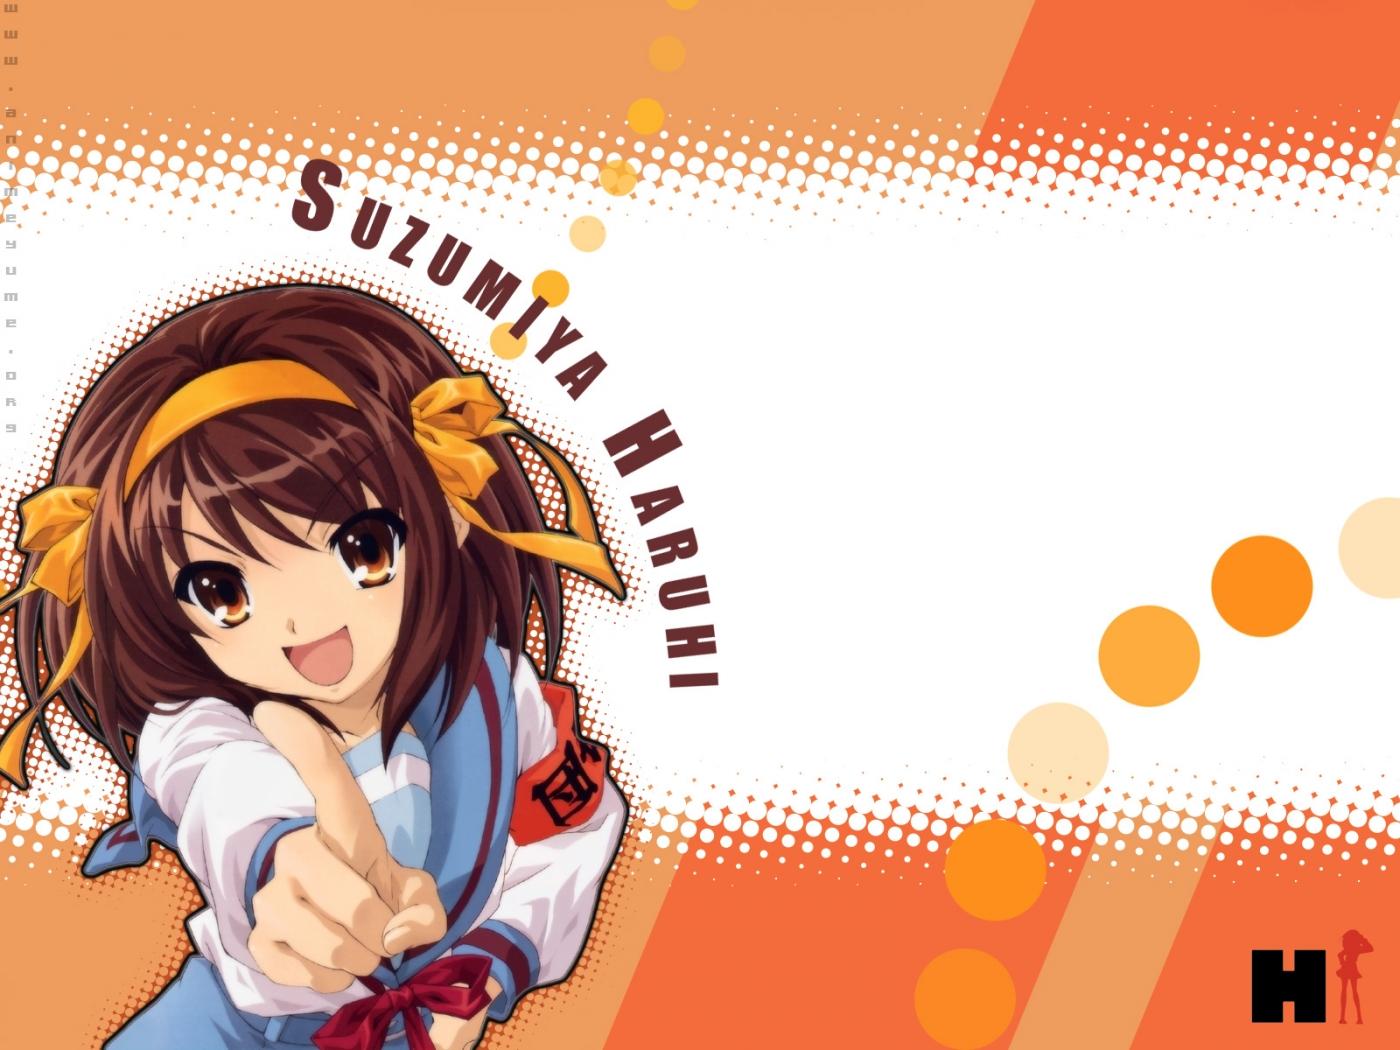 The Melancholy of Haruhi Suzumiya Anime Wallpaper # 17